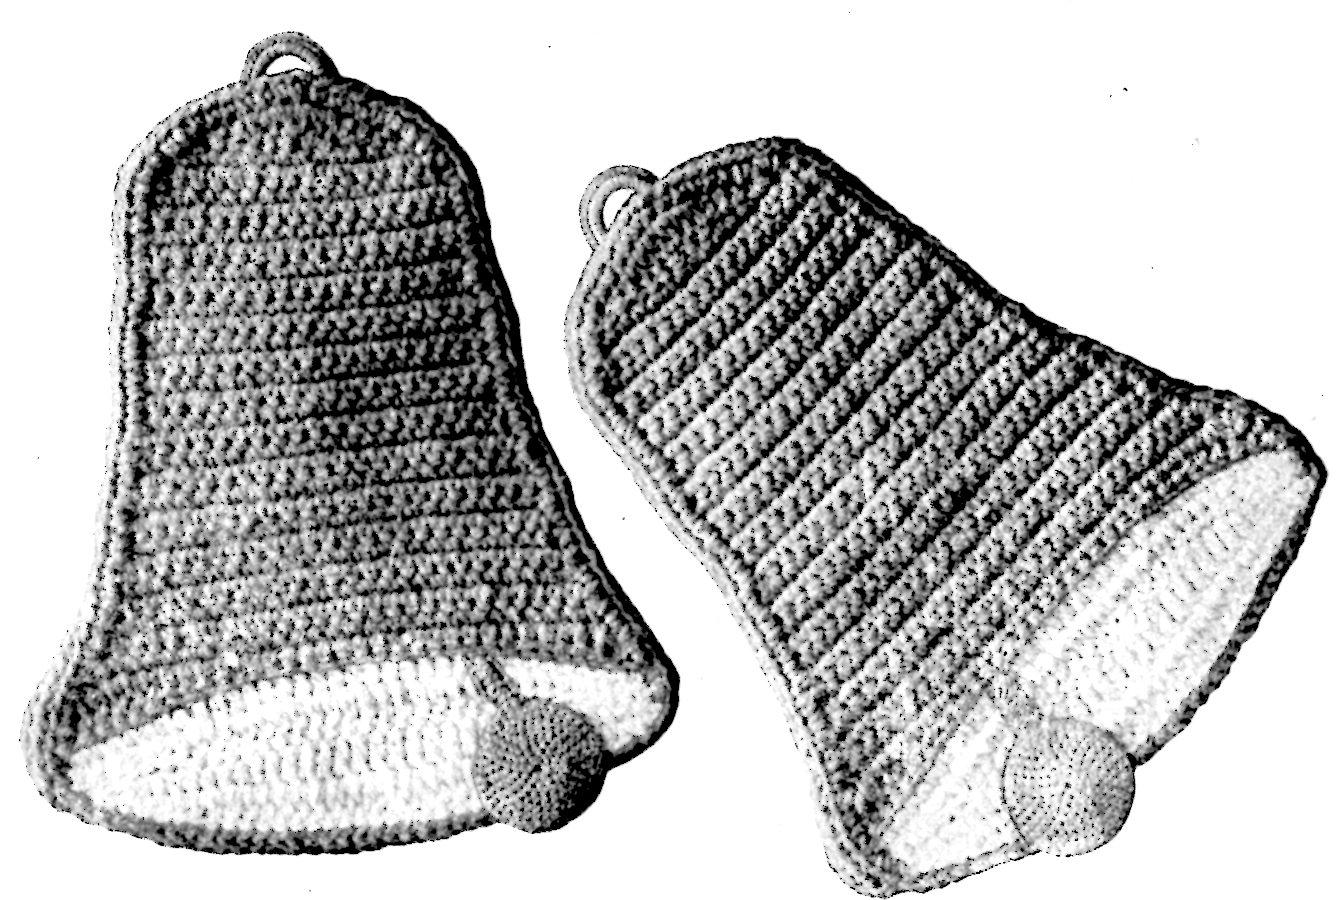 Bell Potholders Vintage Crochet Pattern for Christmas - Vintage ...